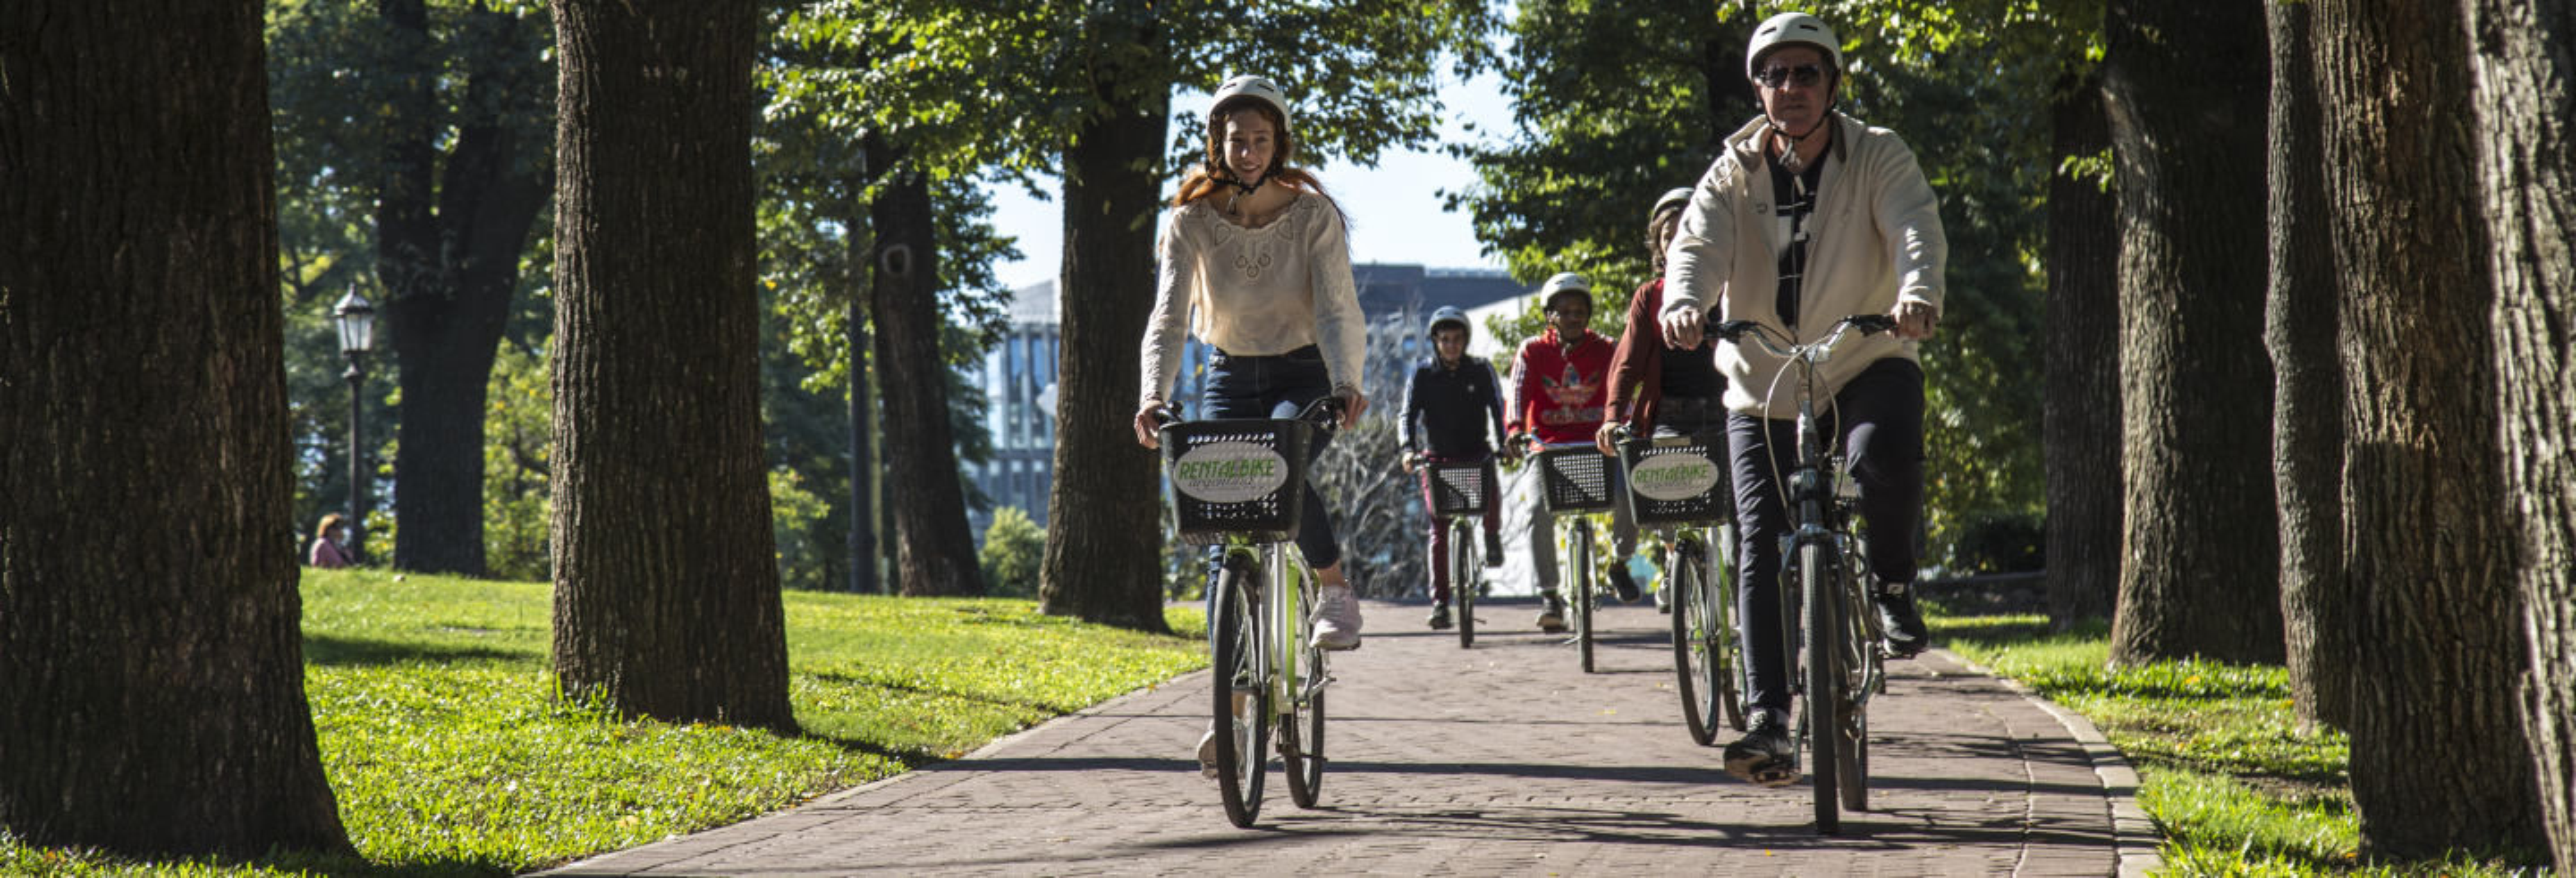 Tour de bicicleta por Buenos Aires